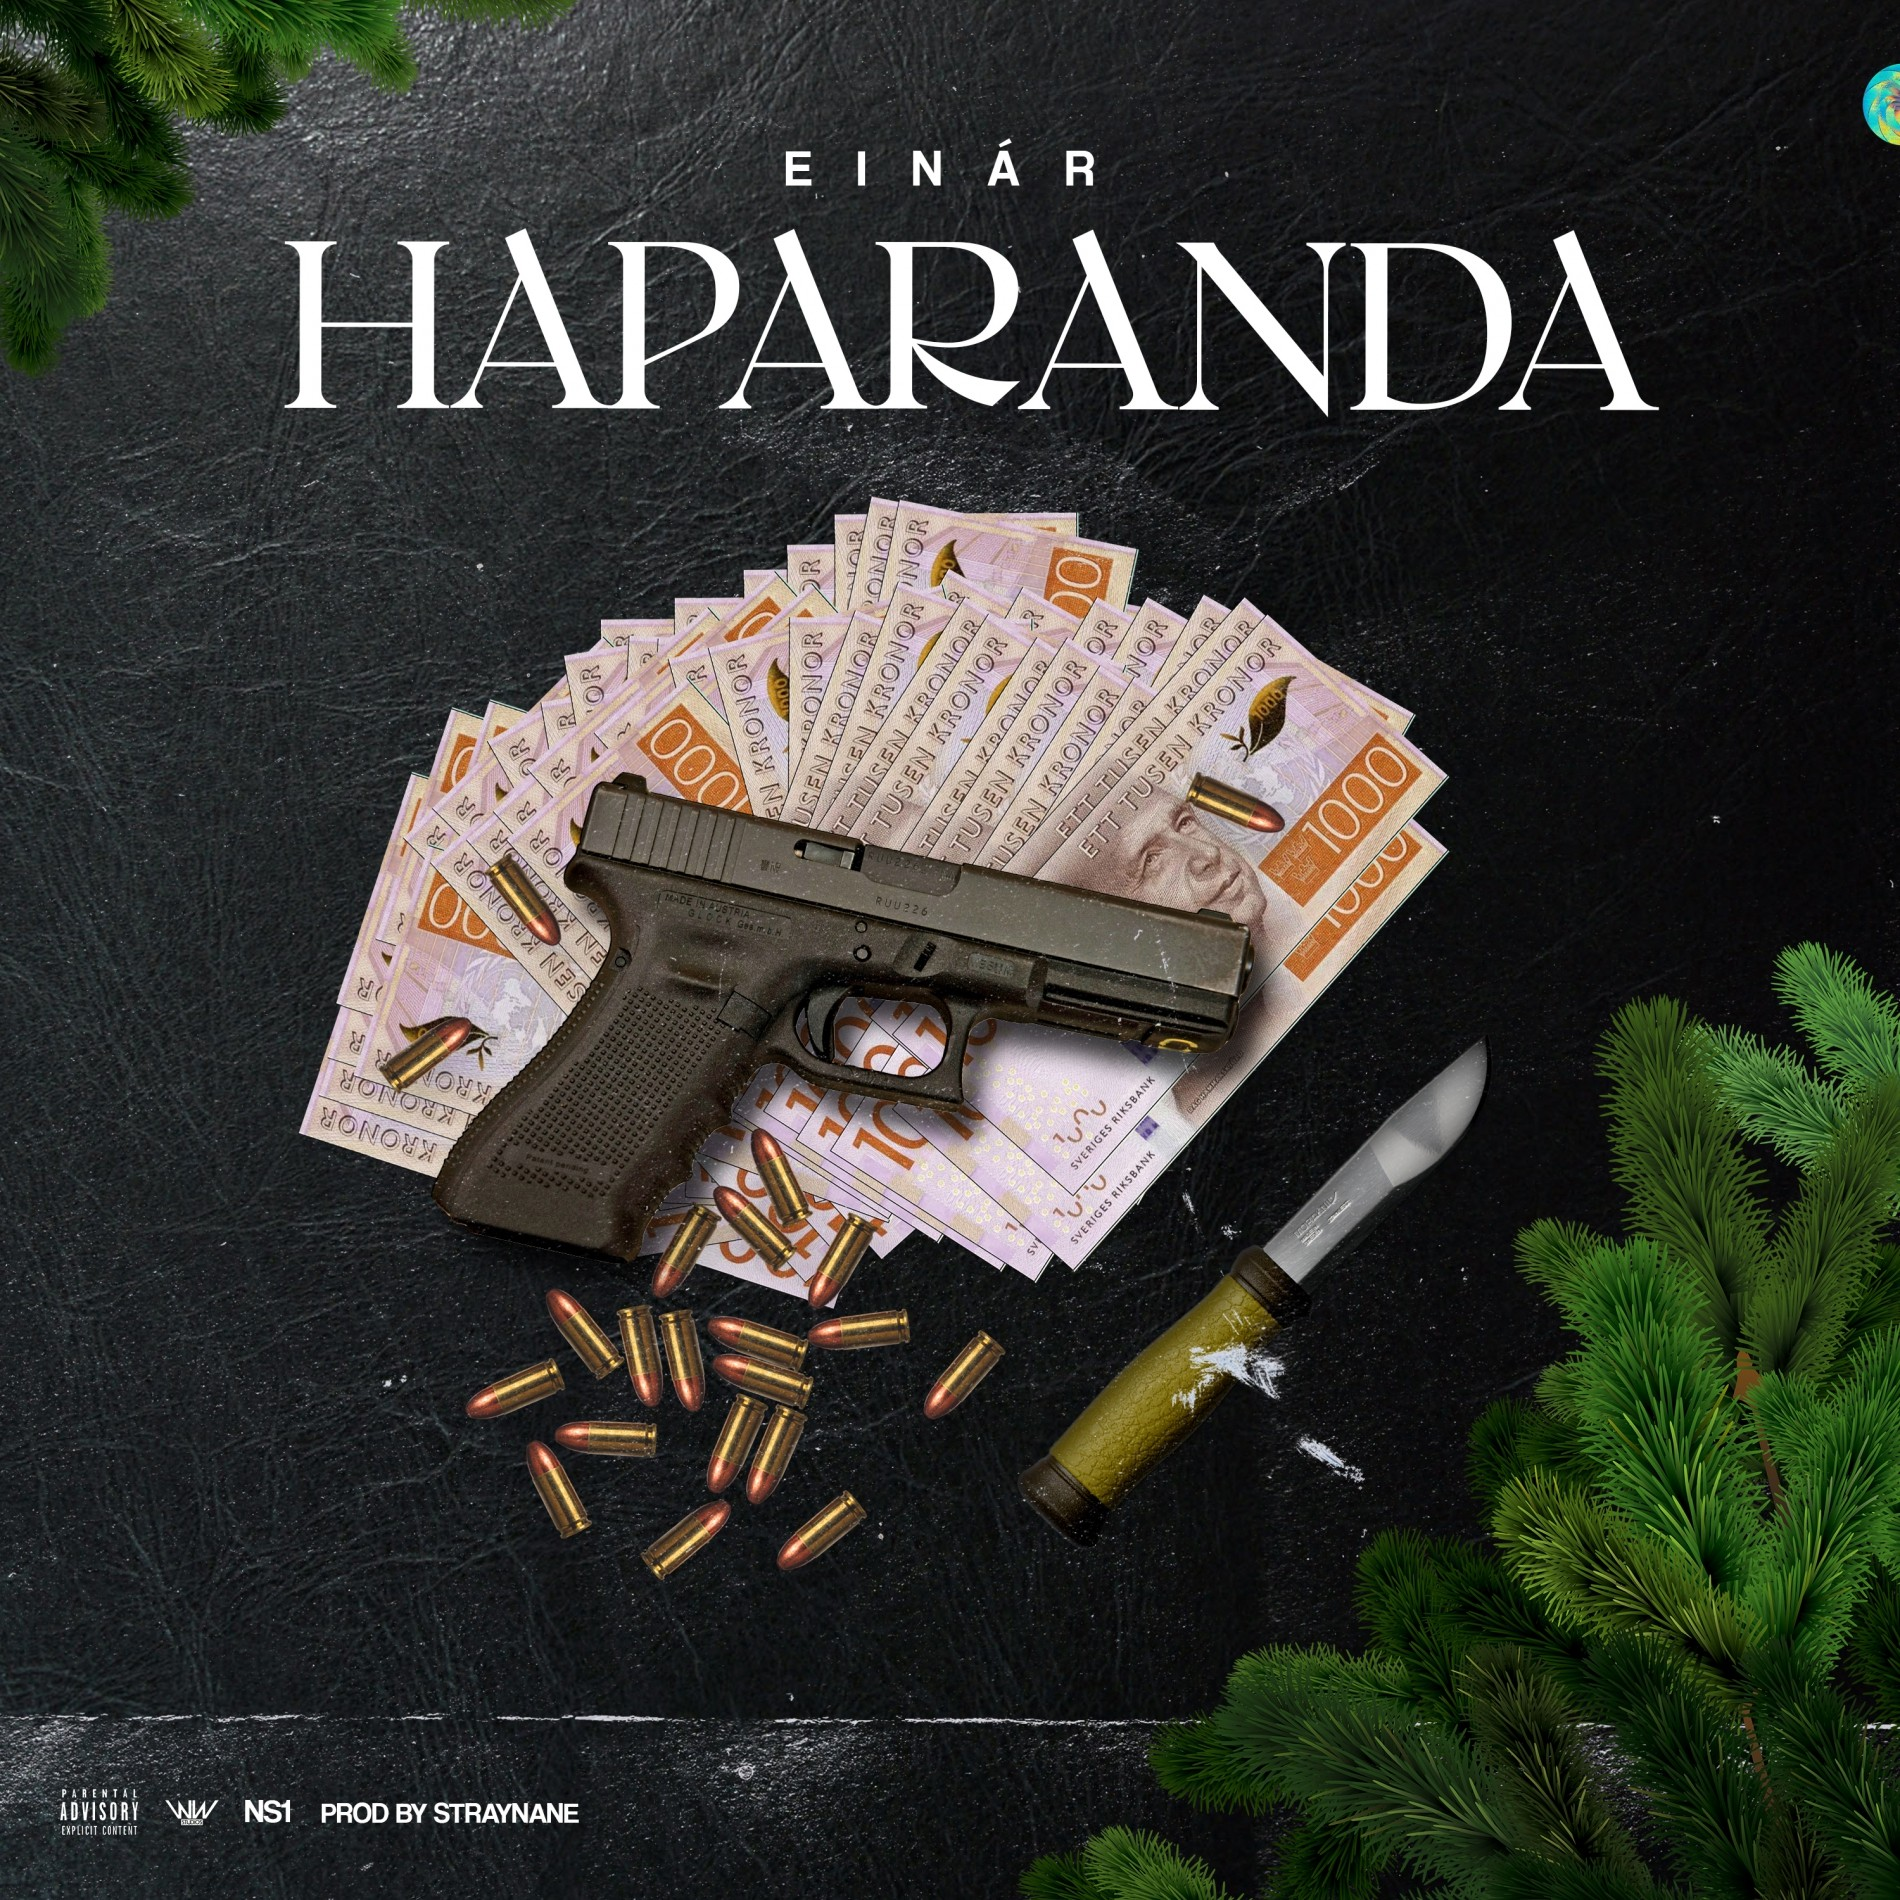 Dejta kvinnor i Haparanda